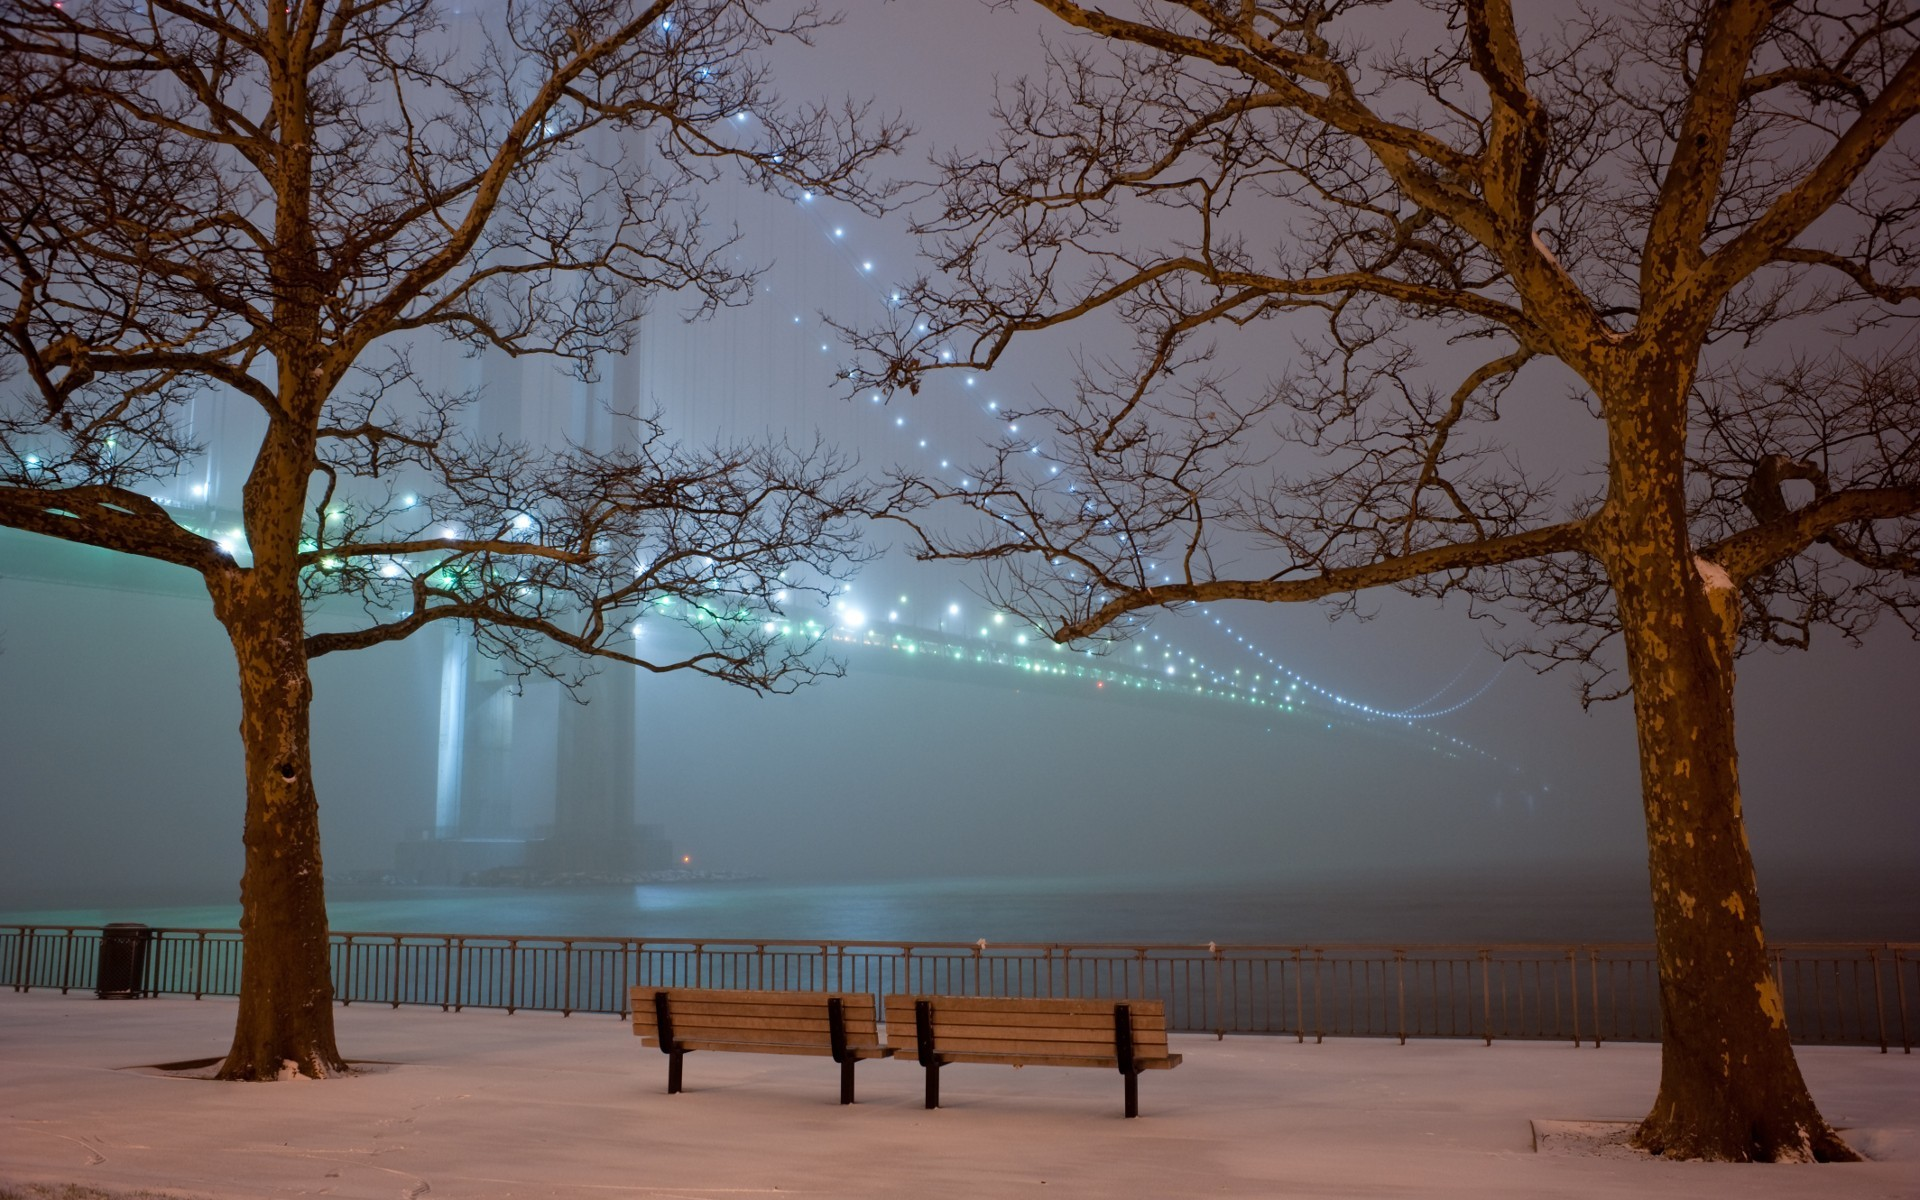 Romantic Winter Night Wallpaper